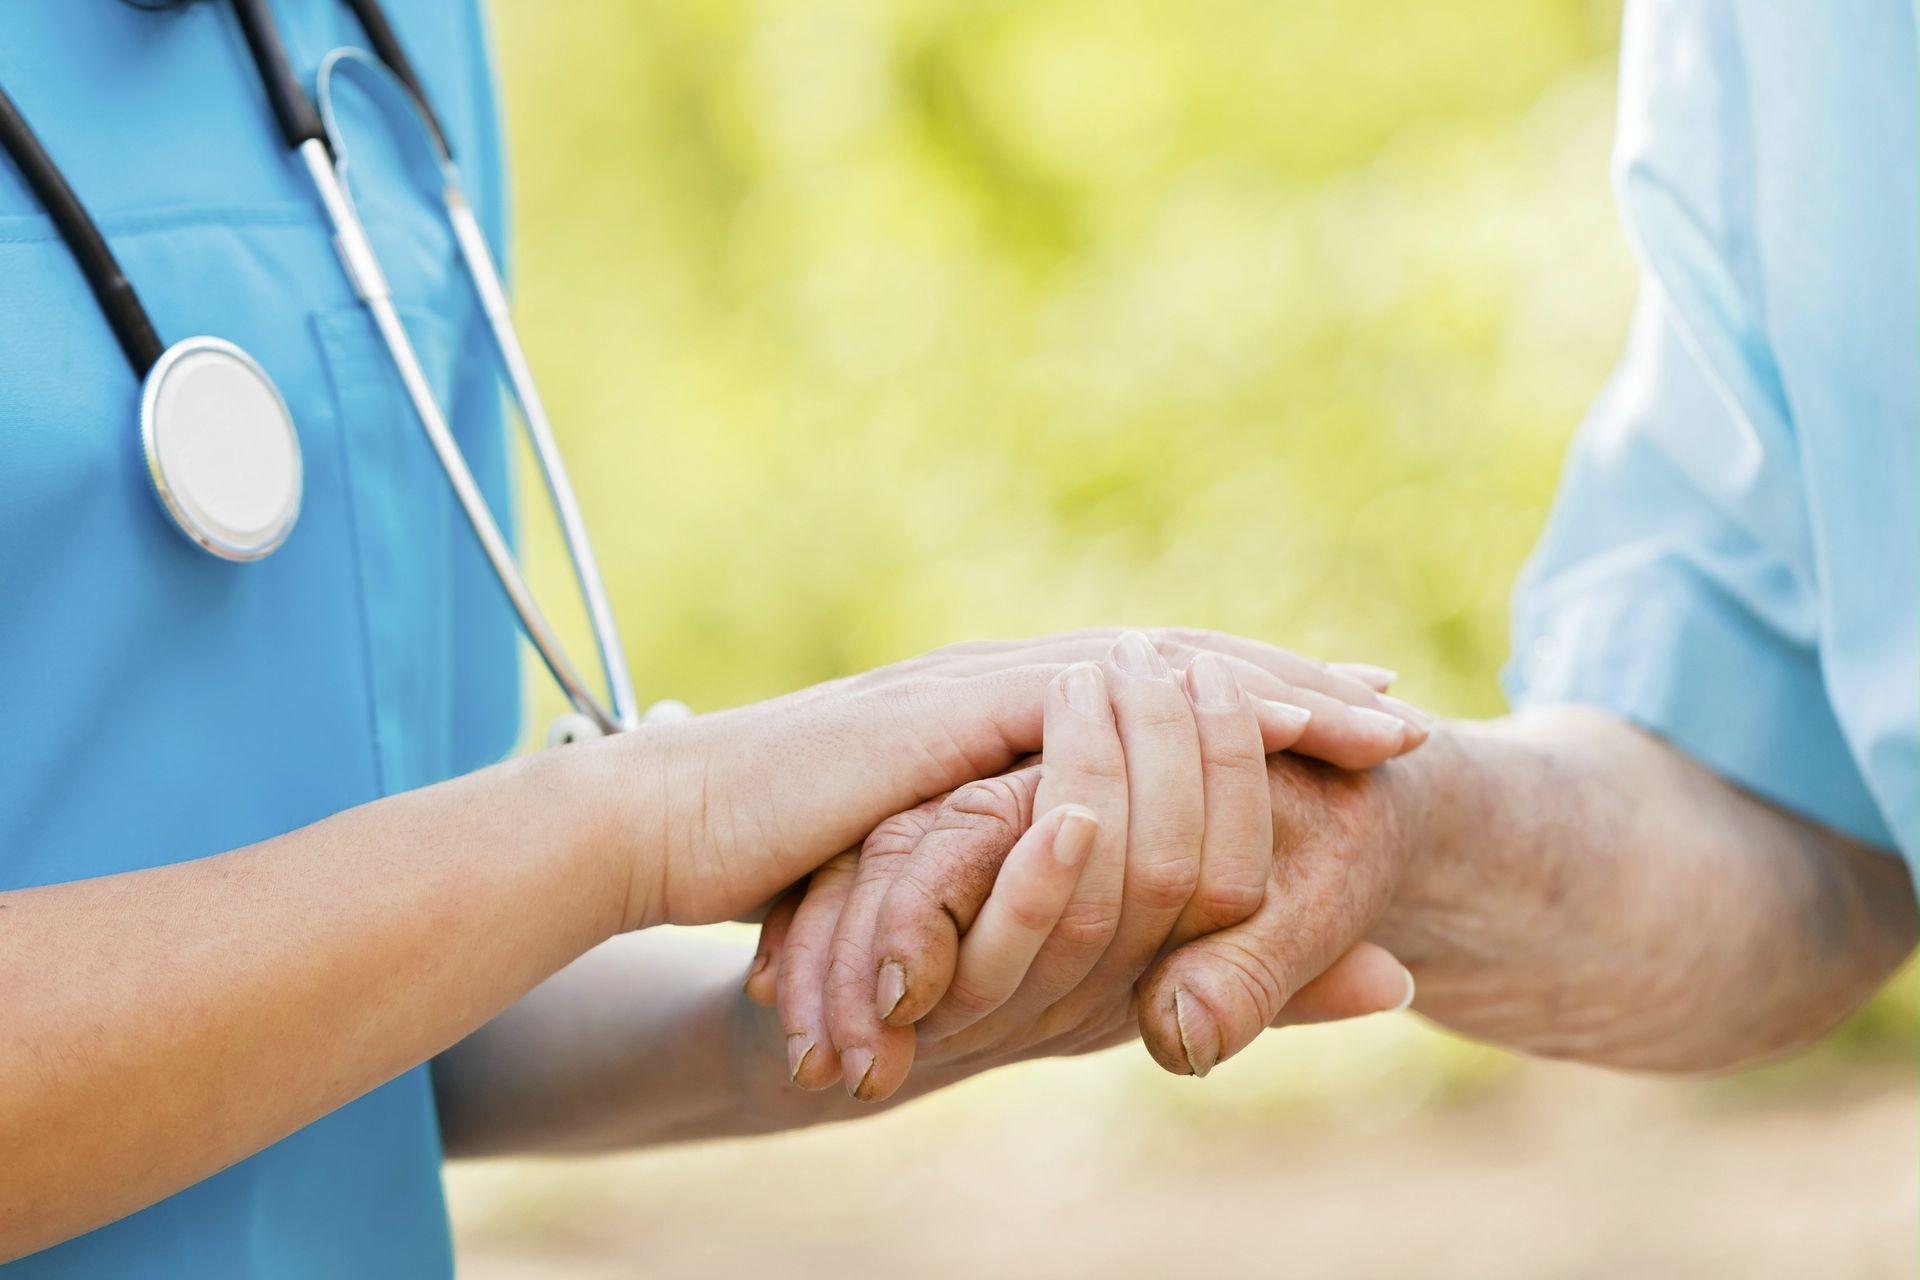 patient-care-care